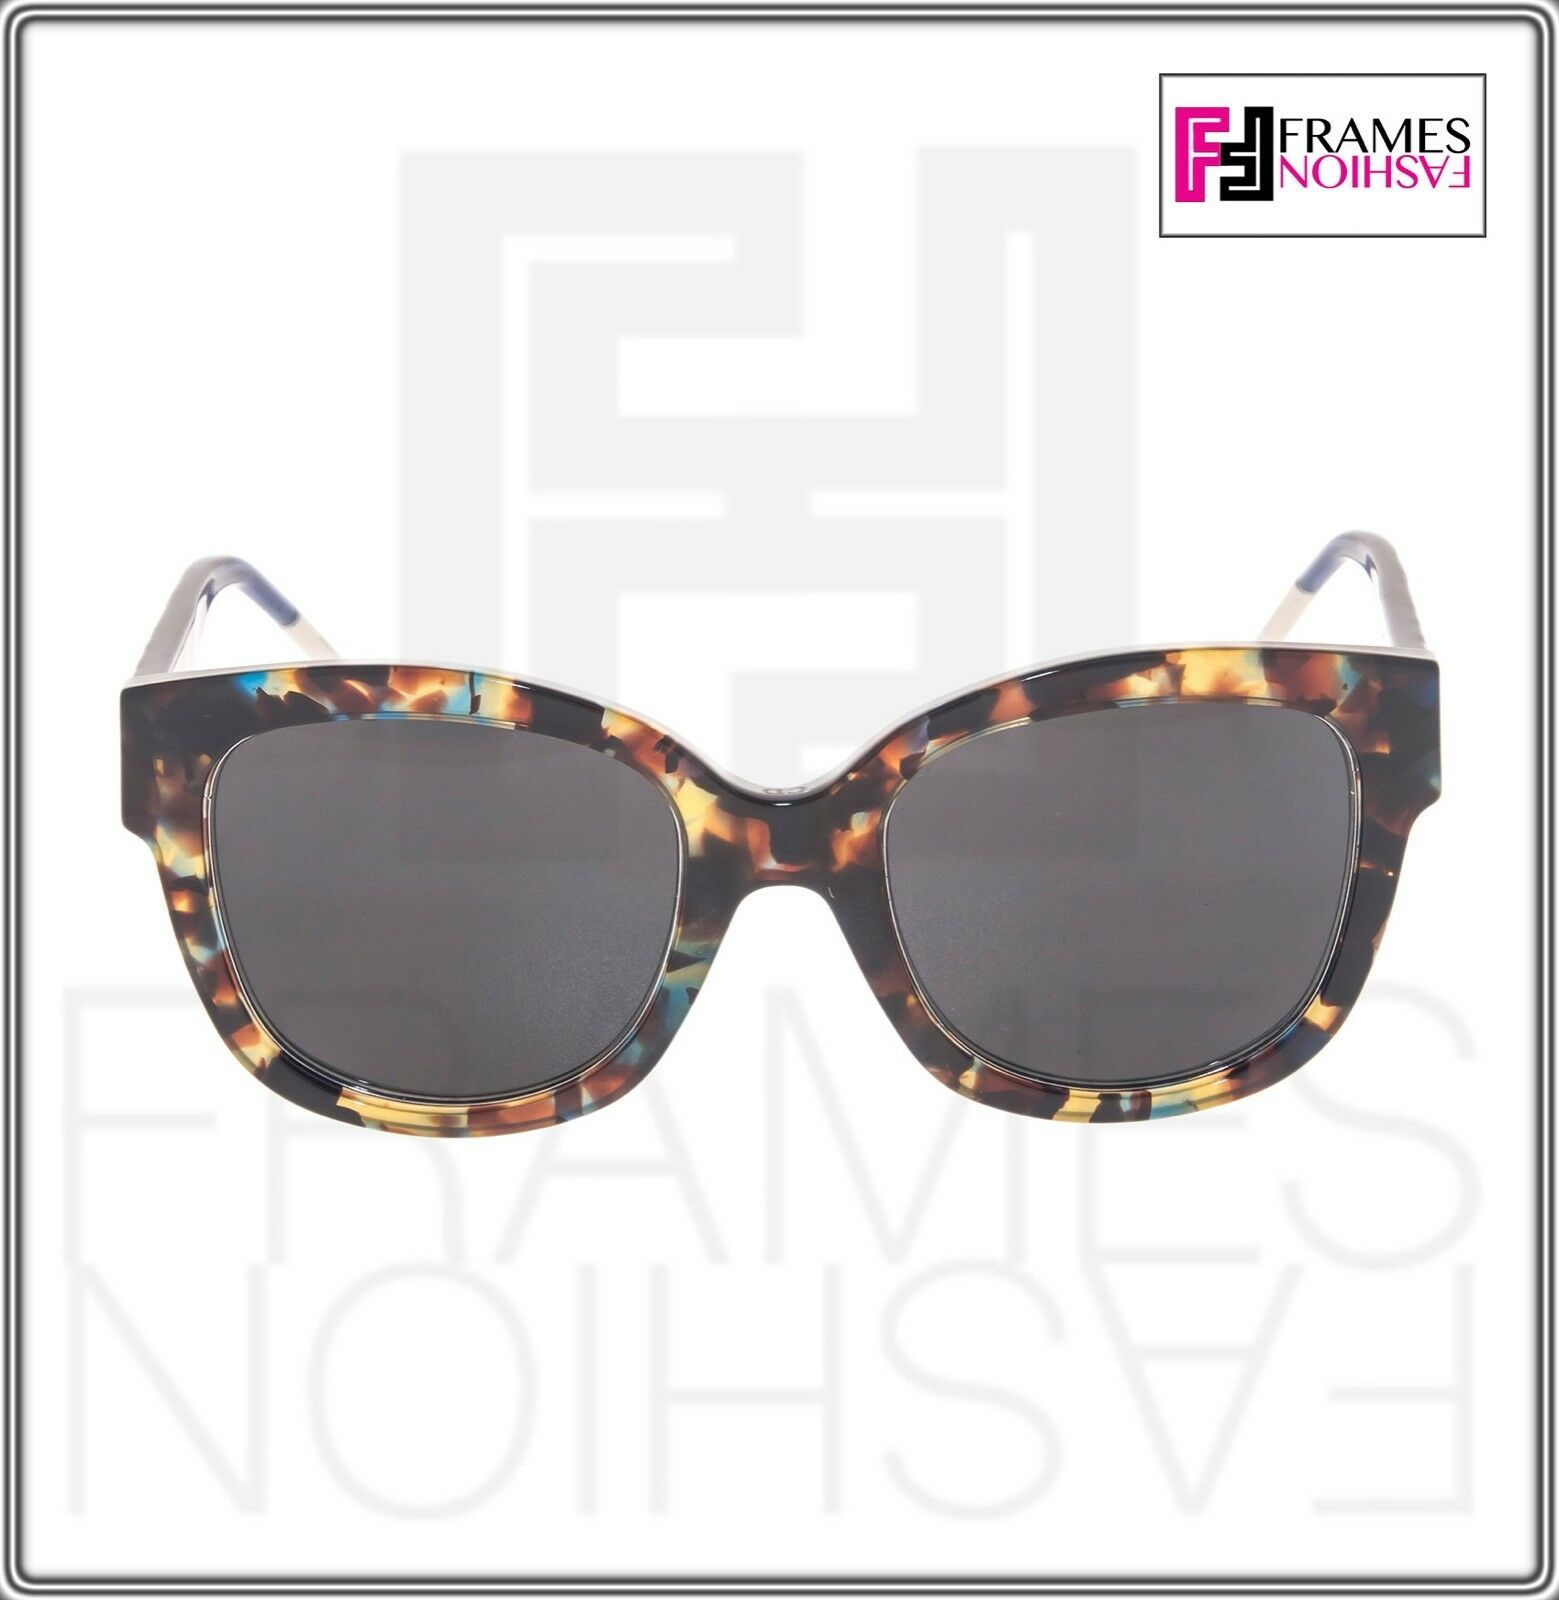 CHRISTIAN DIOR VeryDior 1N Translucent Blue Brown Havana Square Sunglasses